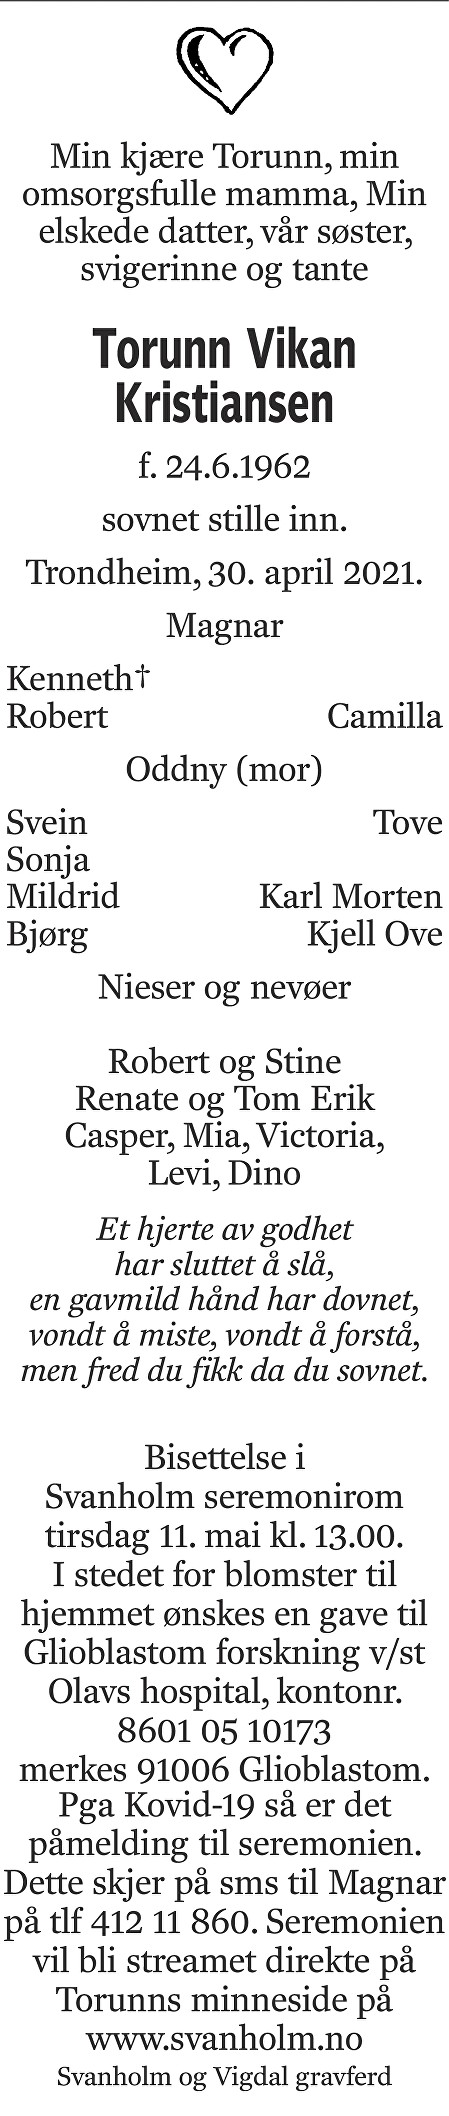 Torunn Vikan Kristiansen Dødsannonse